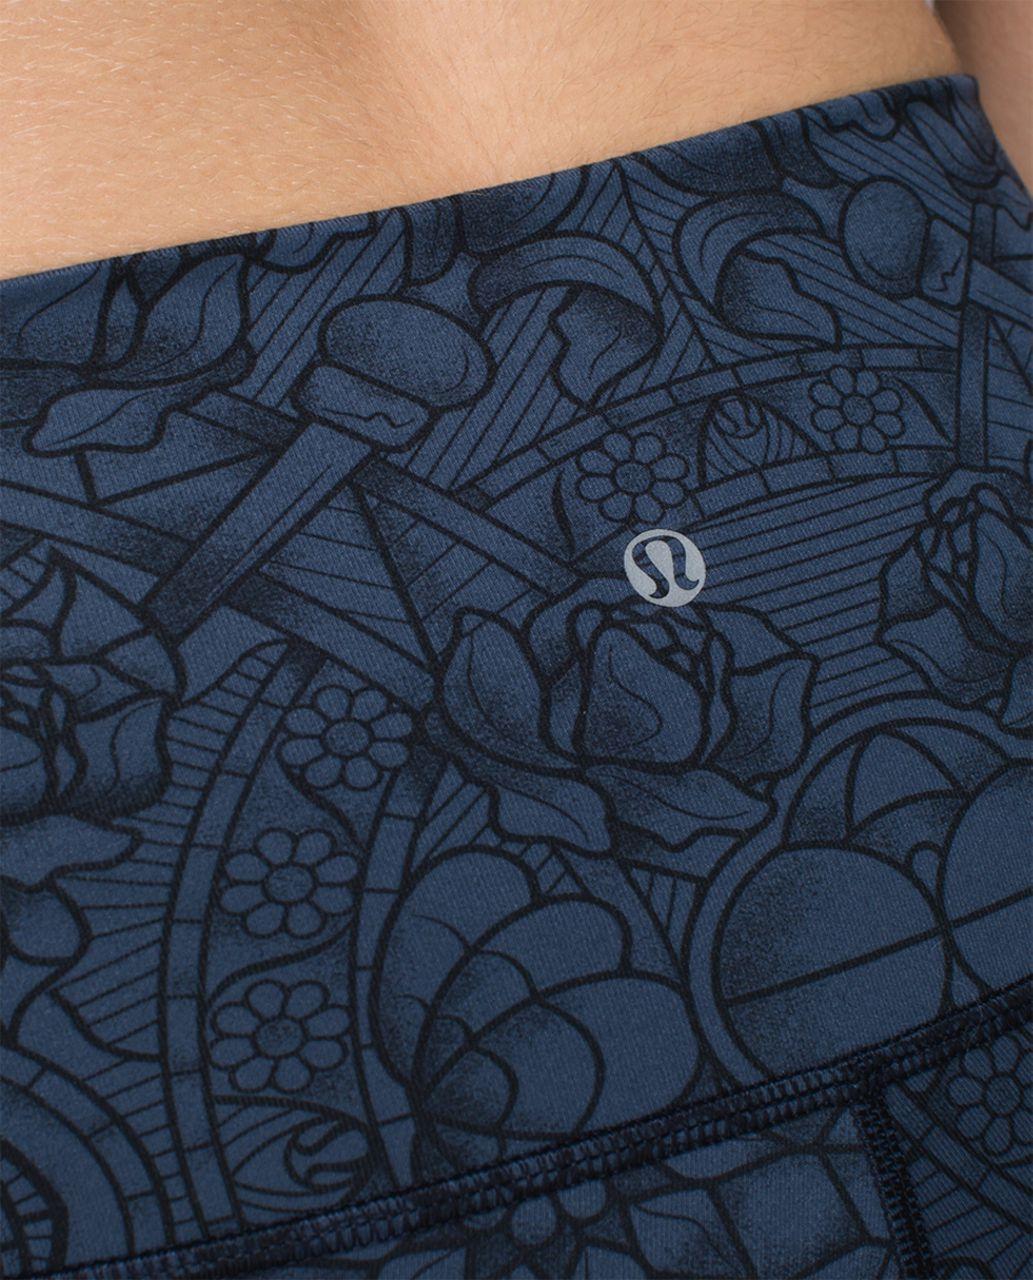 Lululemon Wunder Under Pant *Full-On Luon (Roll Down) - Prisma Inkwell Black